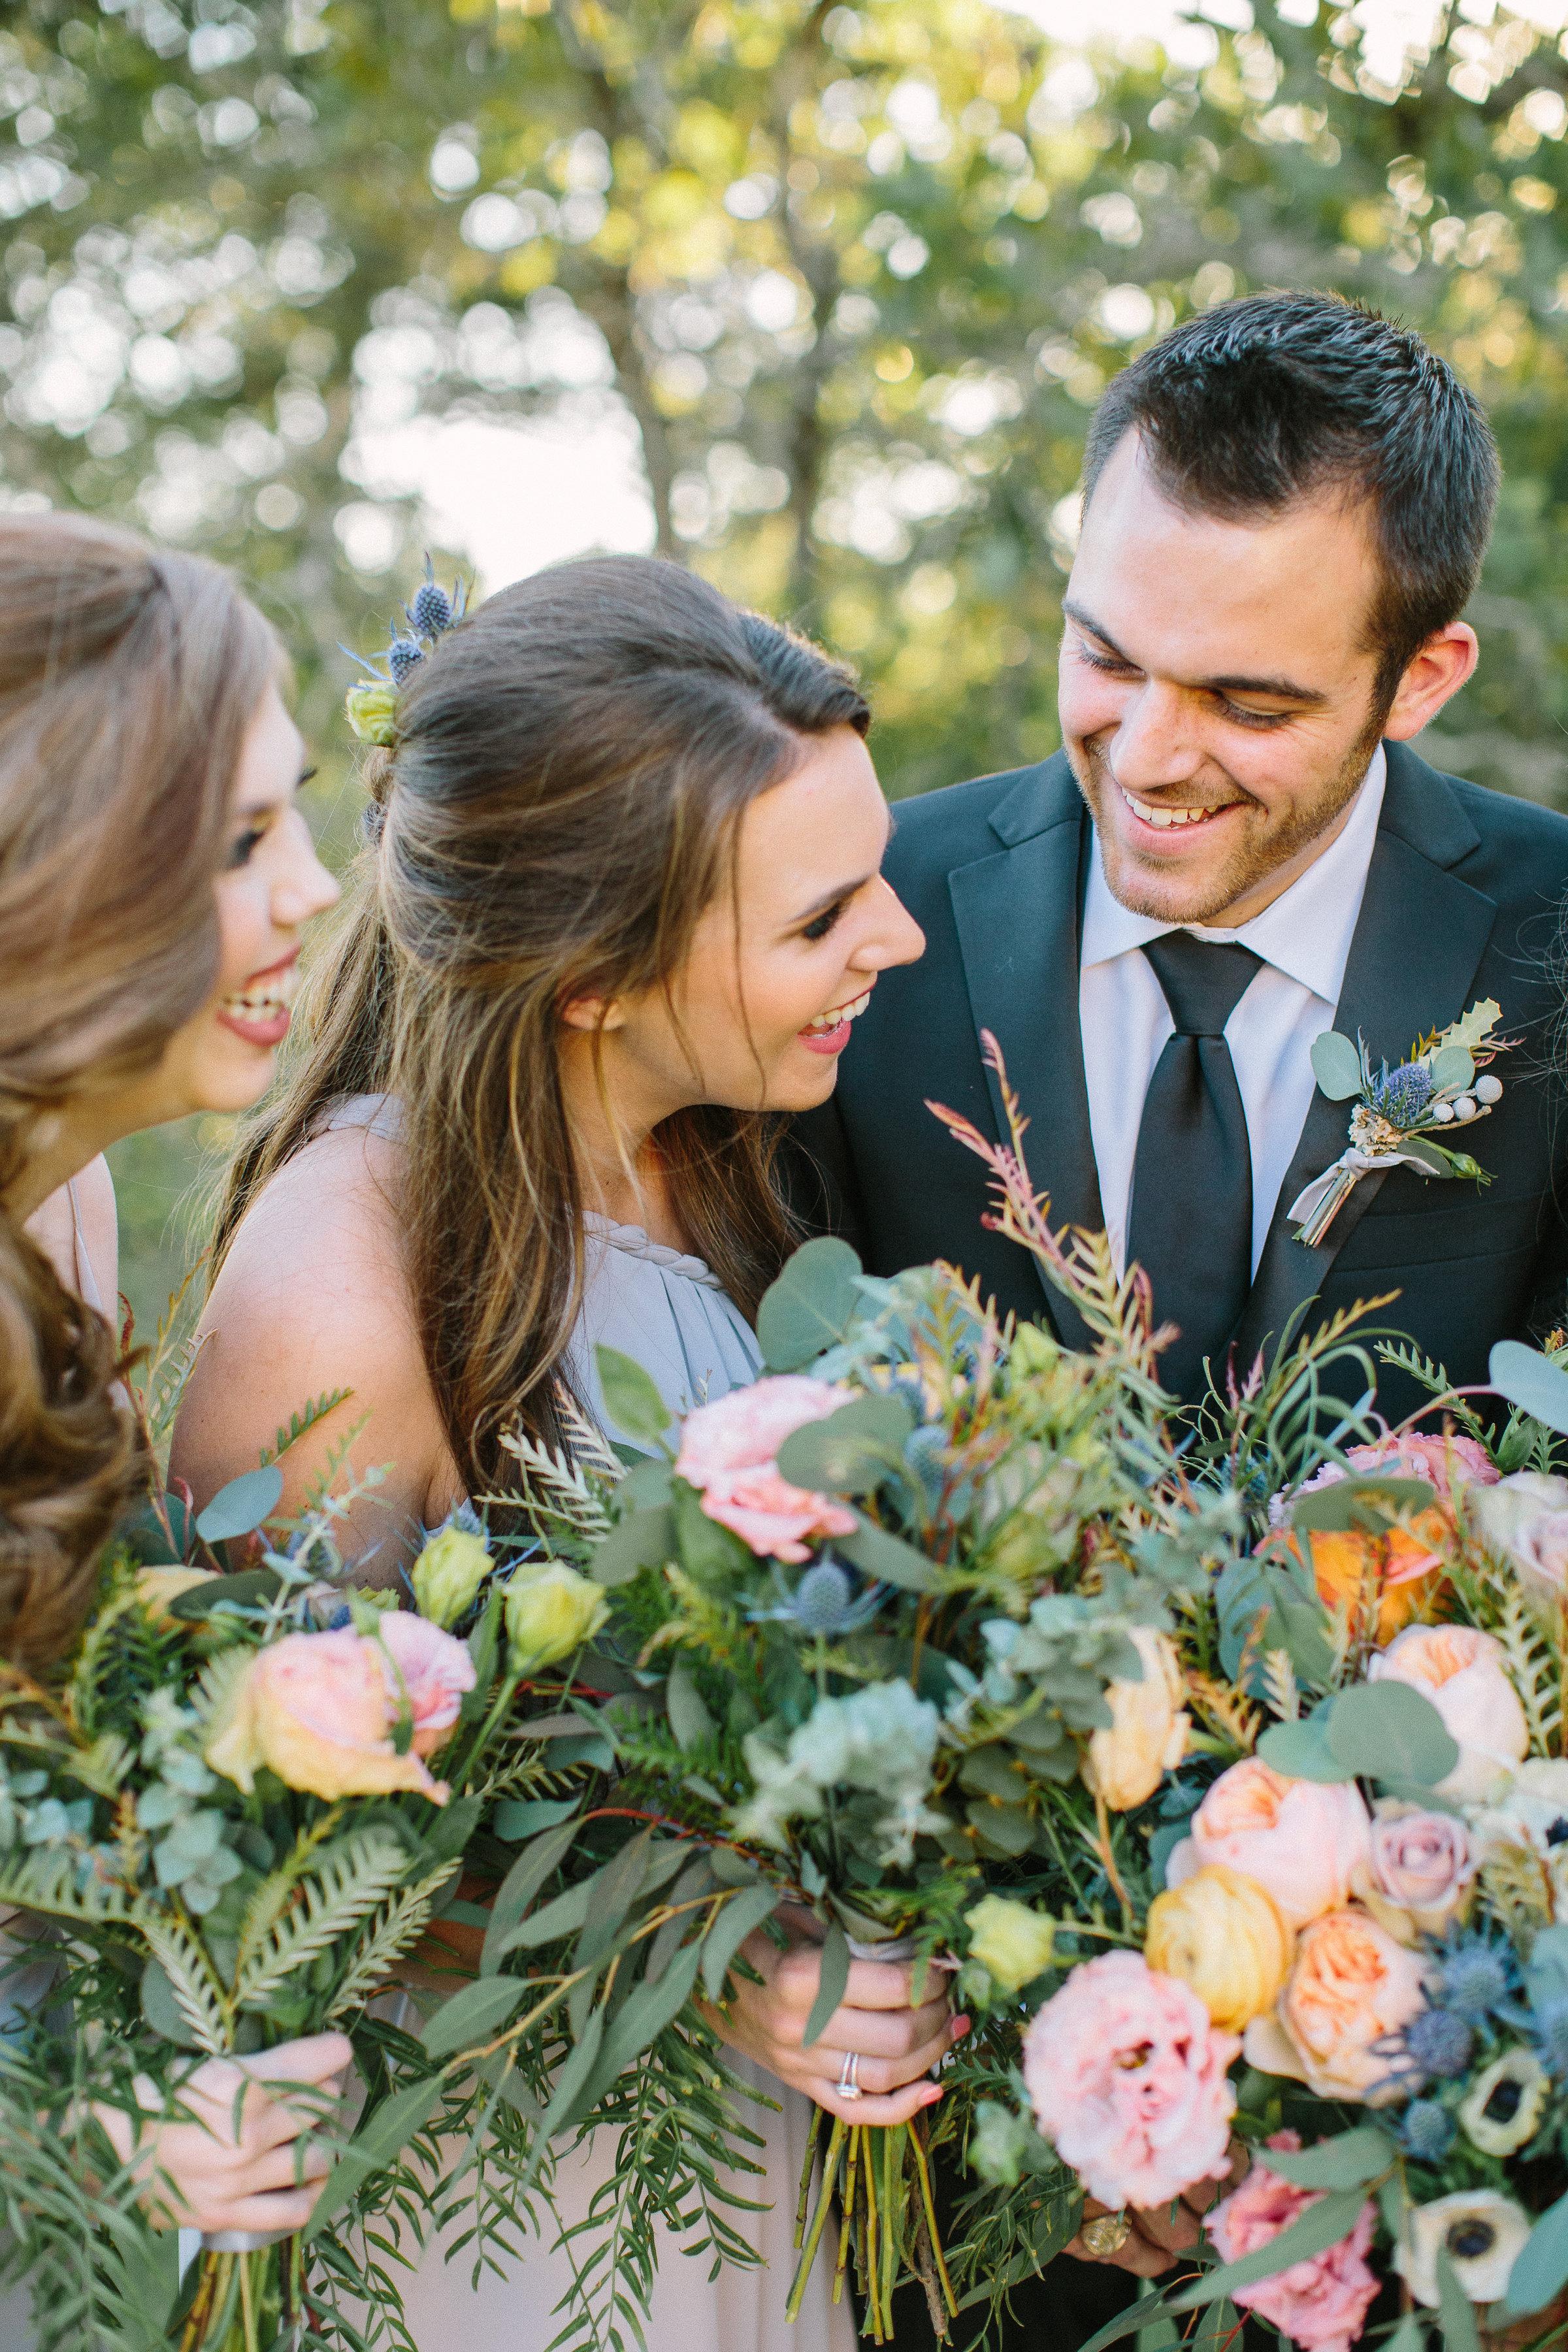 Ellen-Ashton-Photography-Peach-Creek-Ranch-Weddings-Wed-and-Prosper254